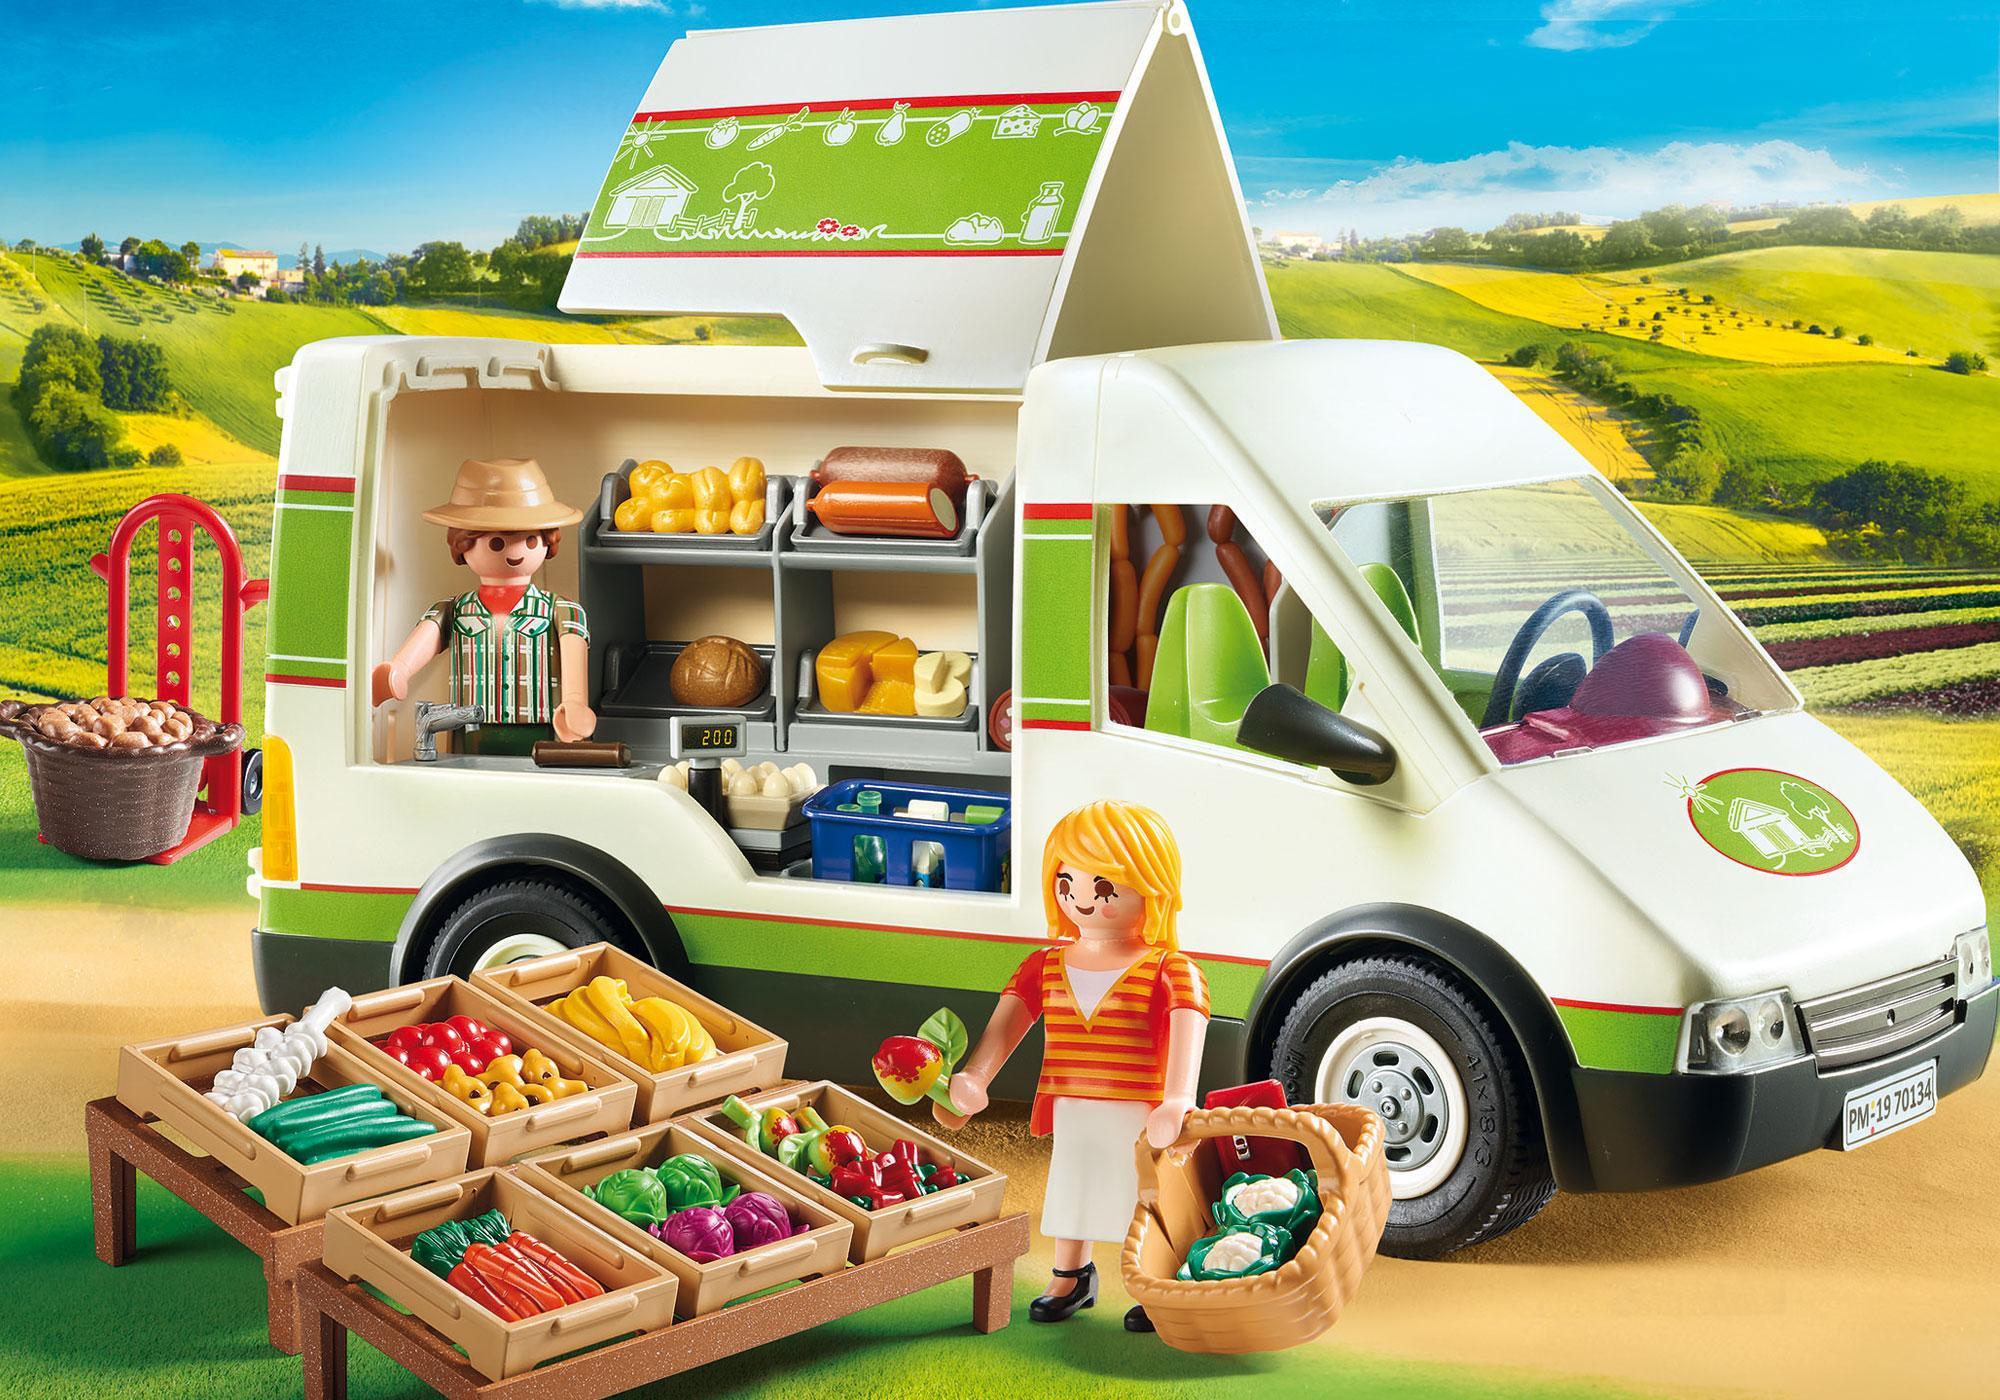 http://media.playmobil.com/i/playmobil/70134_product_detail/Marktkraamwagen